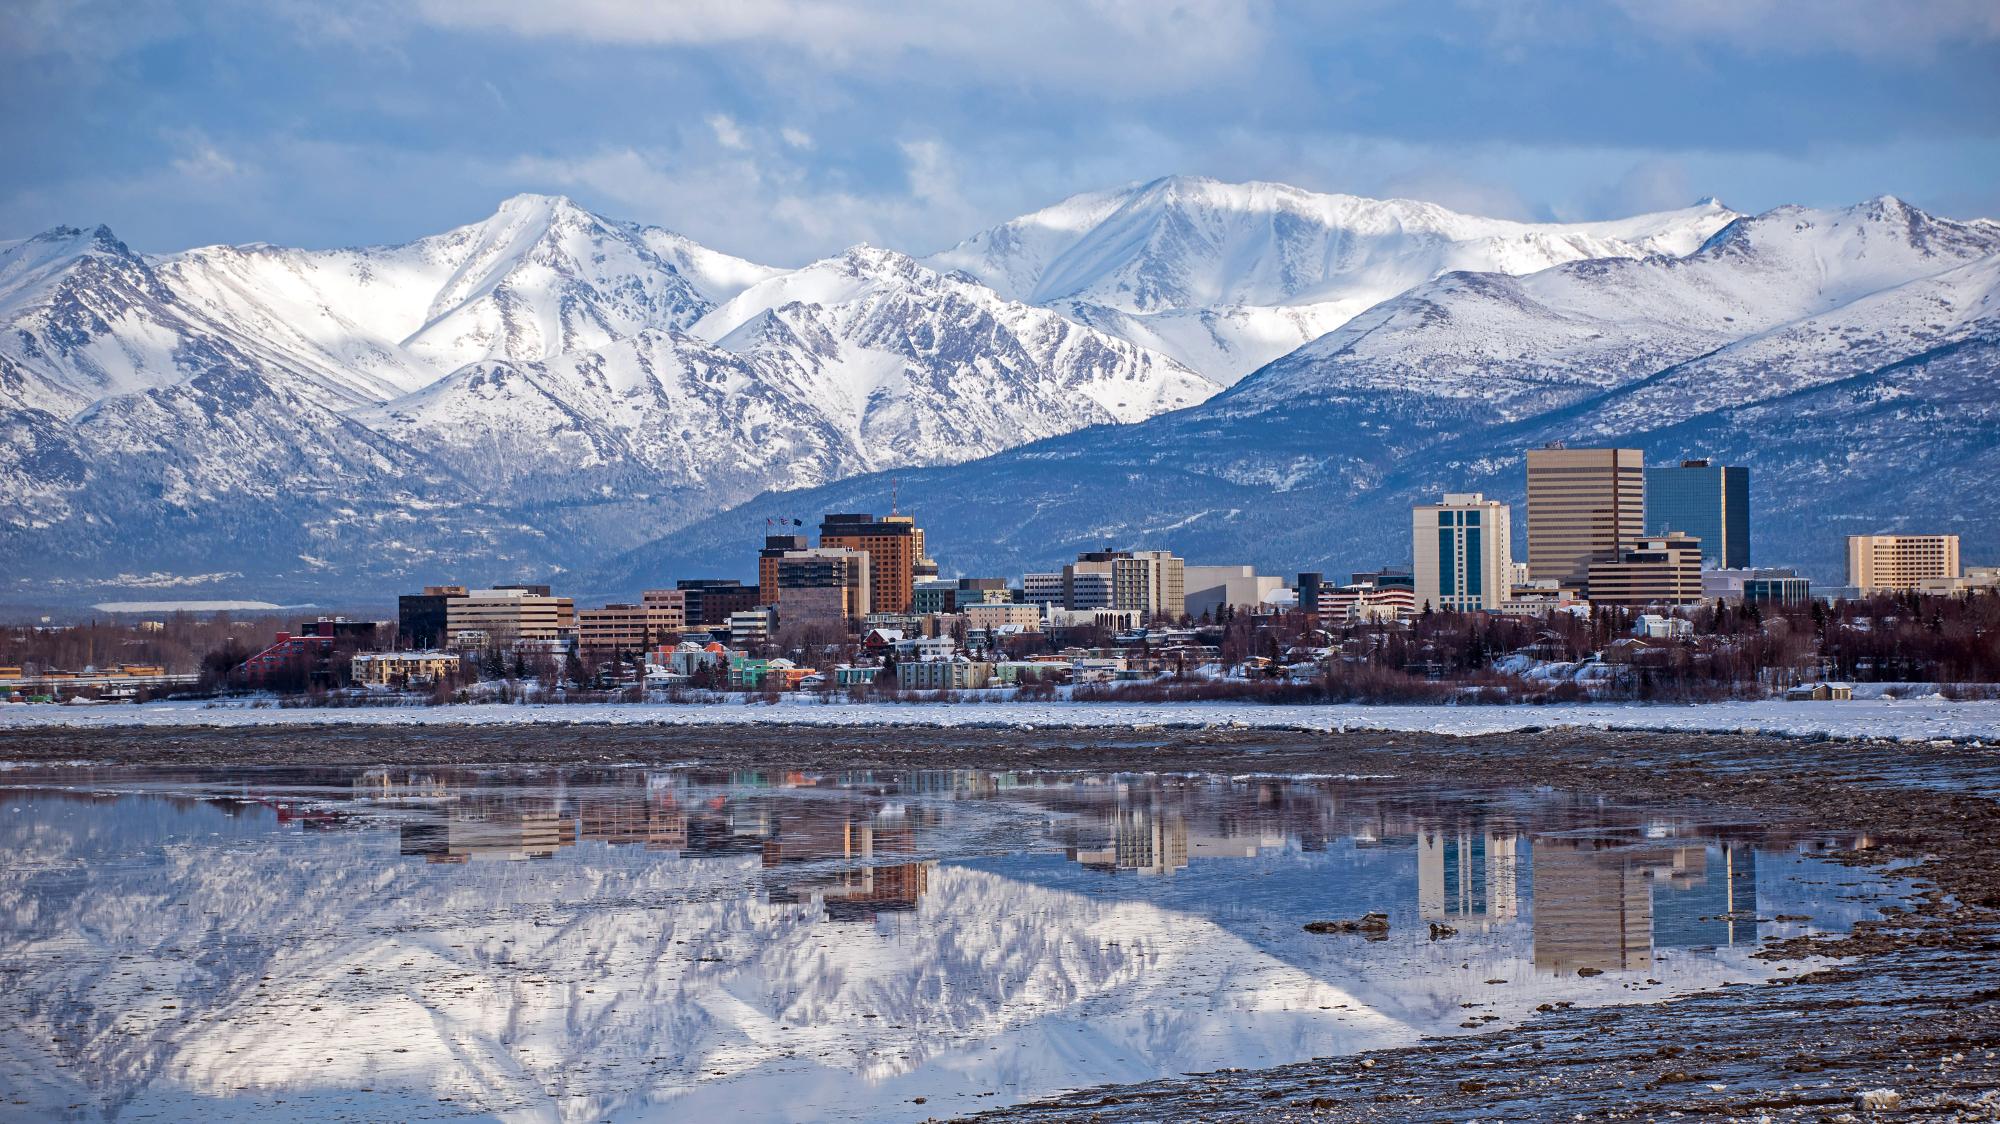 ALASKA STATE SOCIETY OF ORTHODONTISTS MEETING